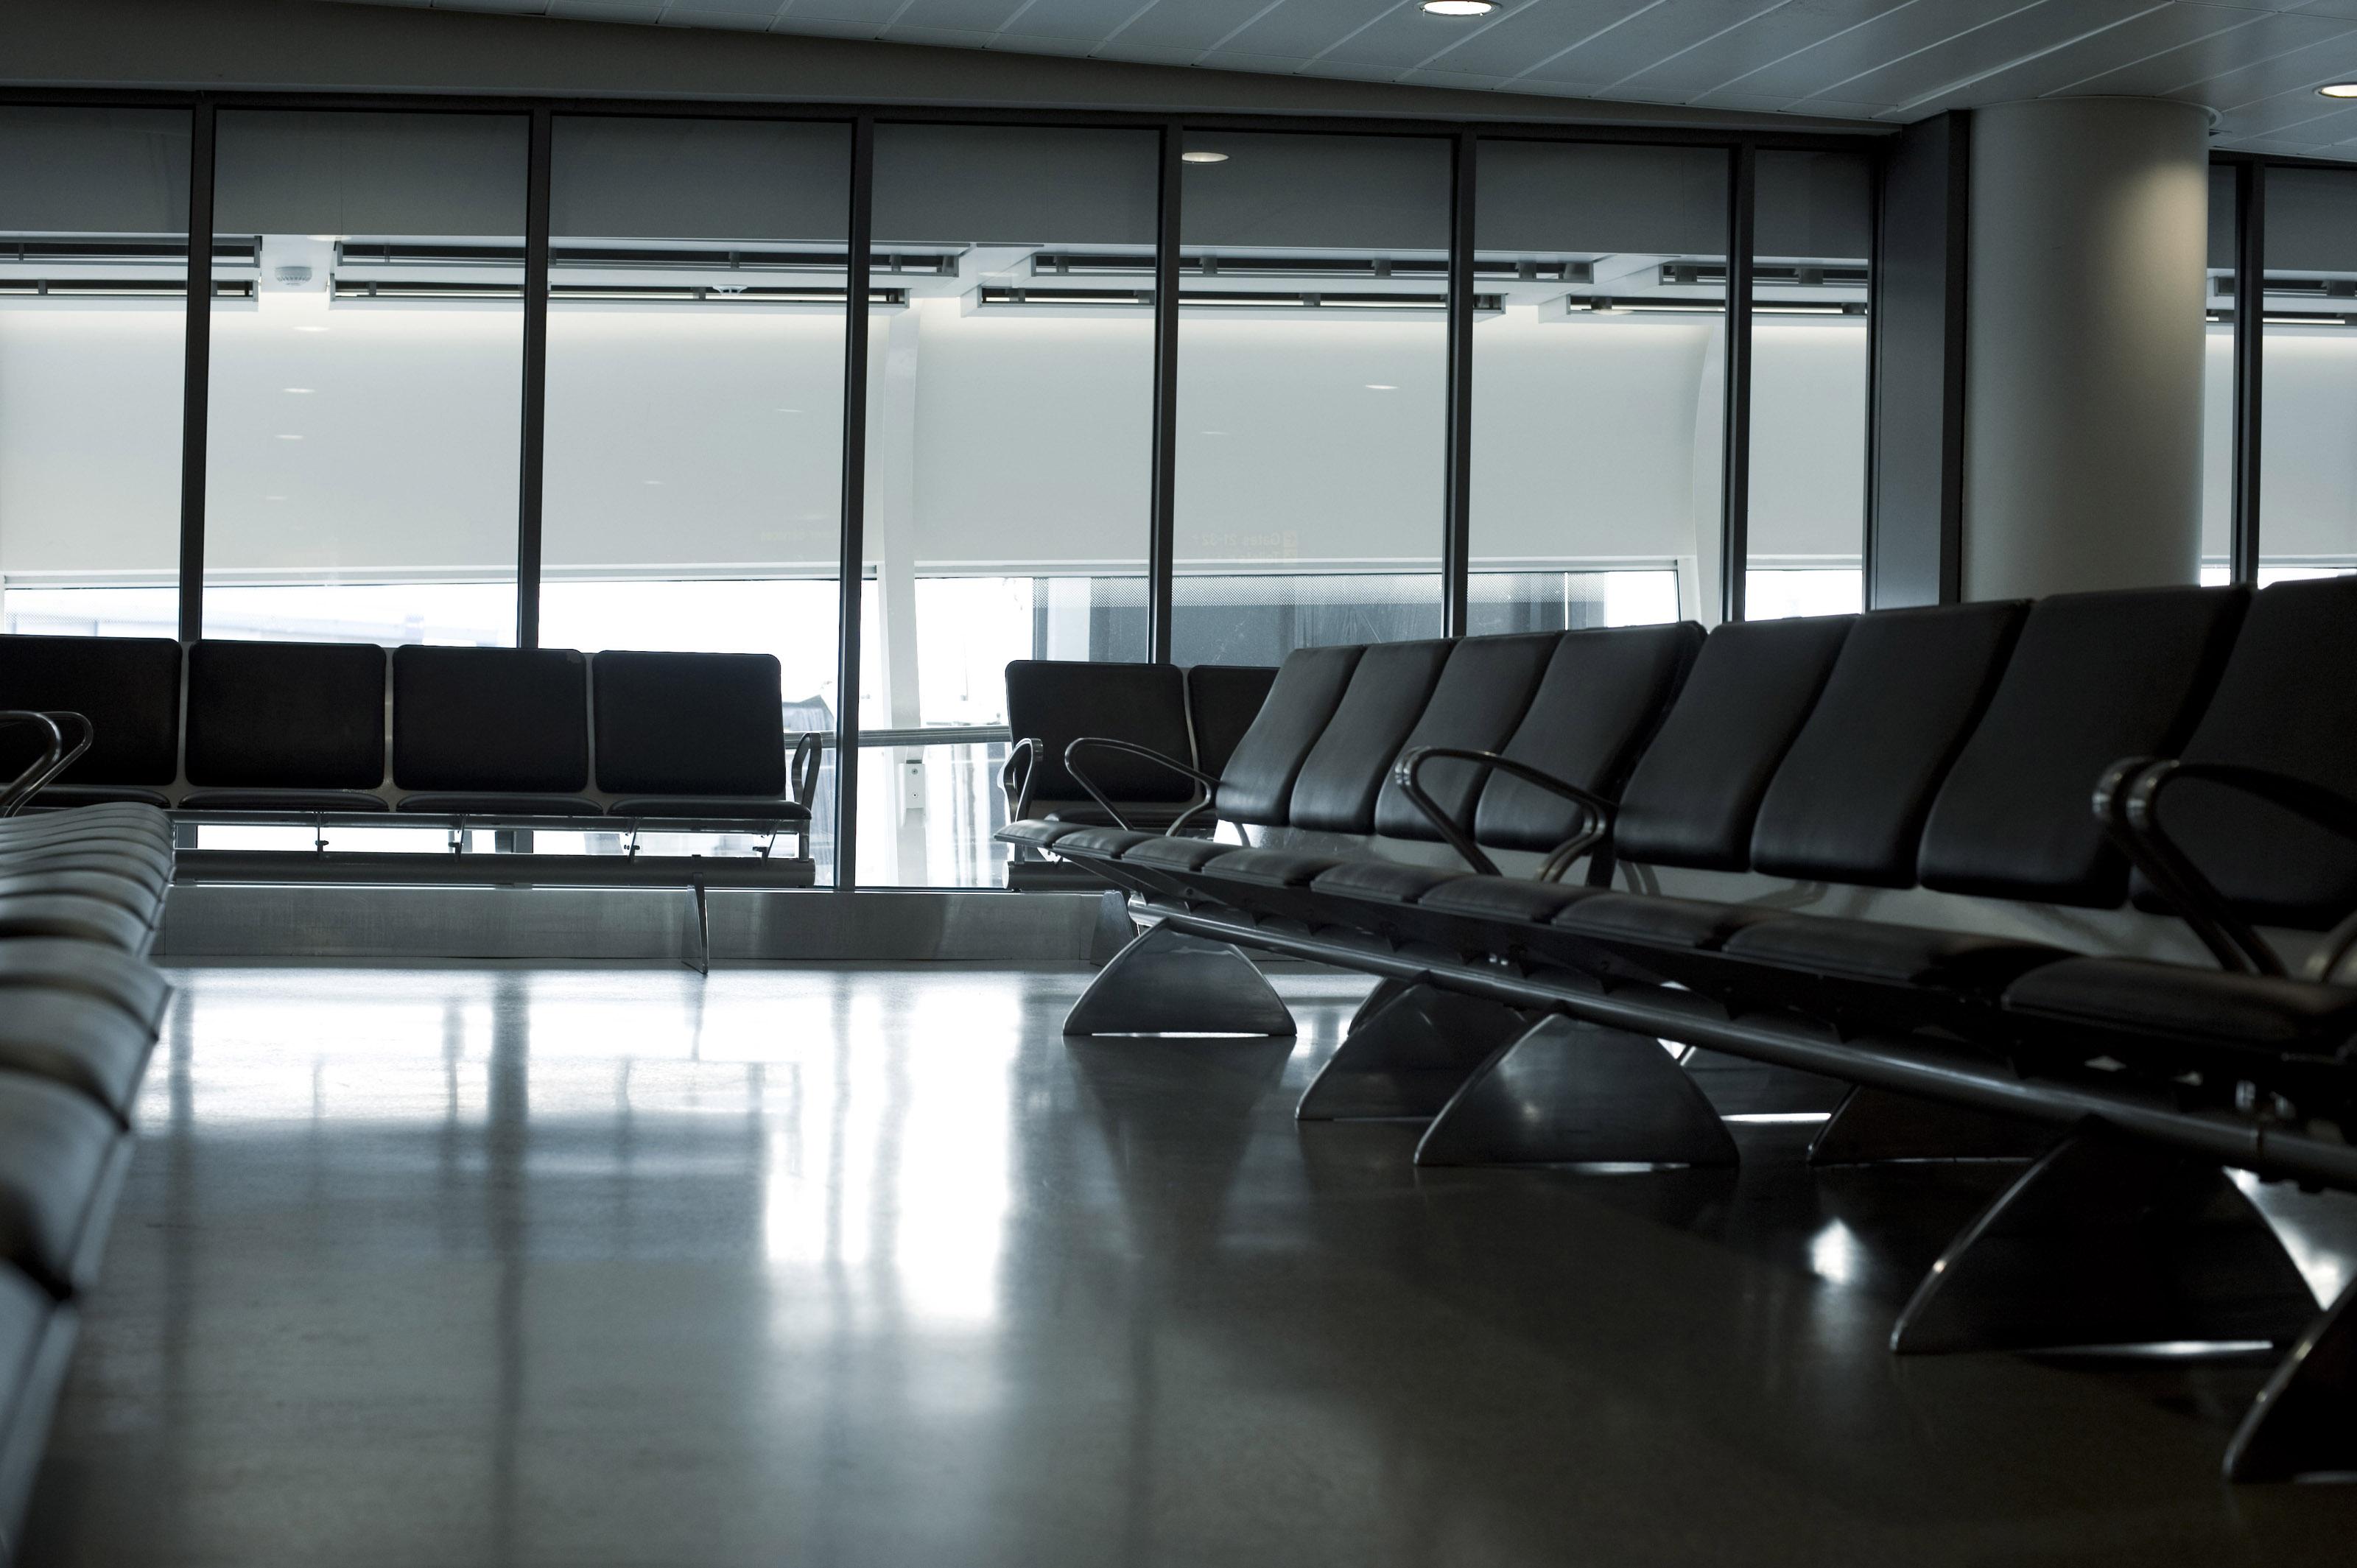 Empty airport terminal 4008 stockarch free stock photos